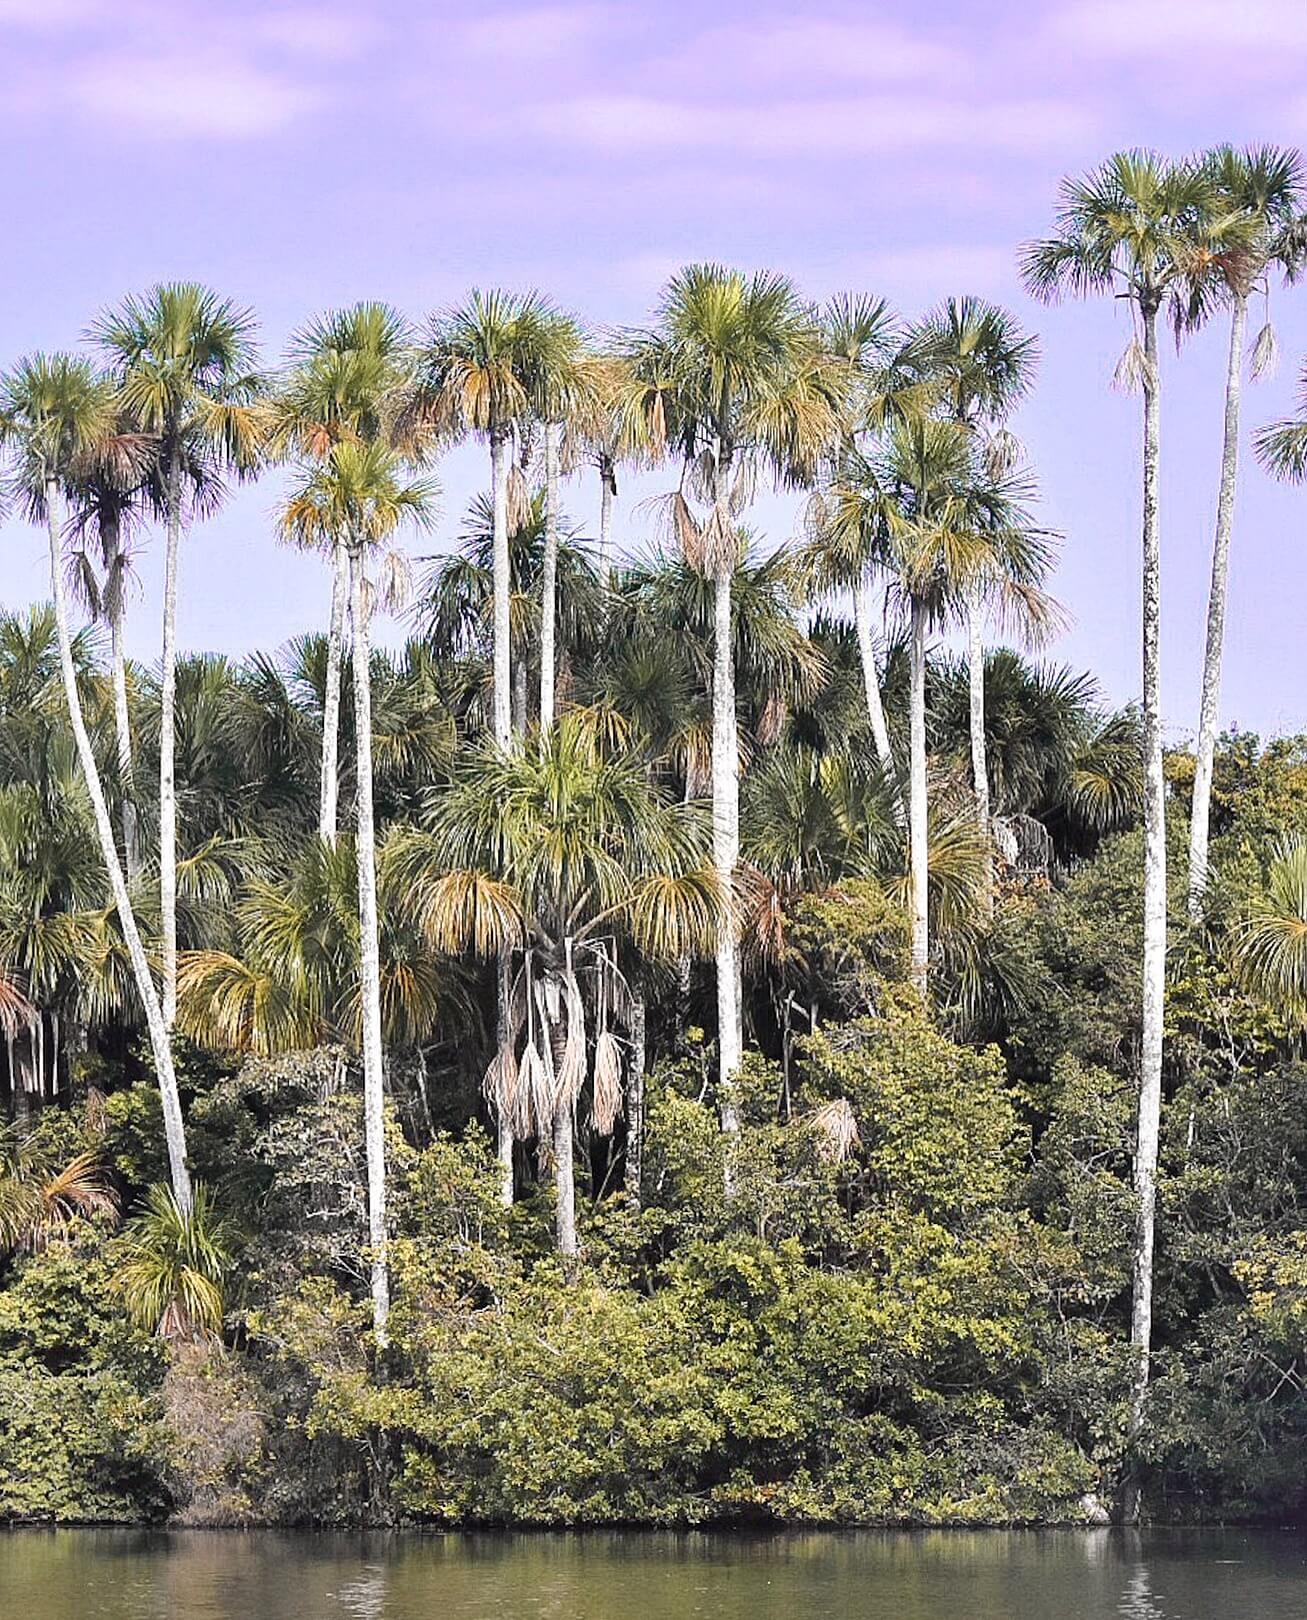 Tall Palm Trees surrounding Lake Sandoval in Peru